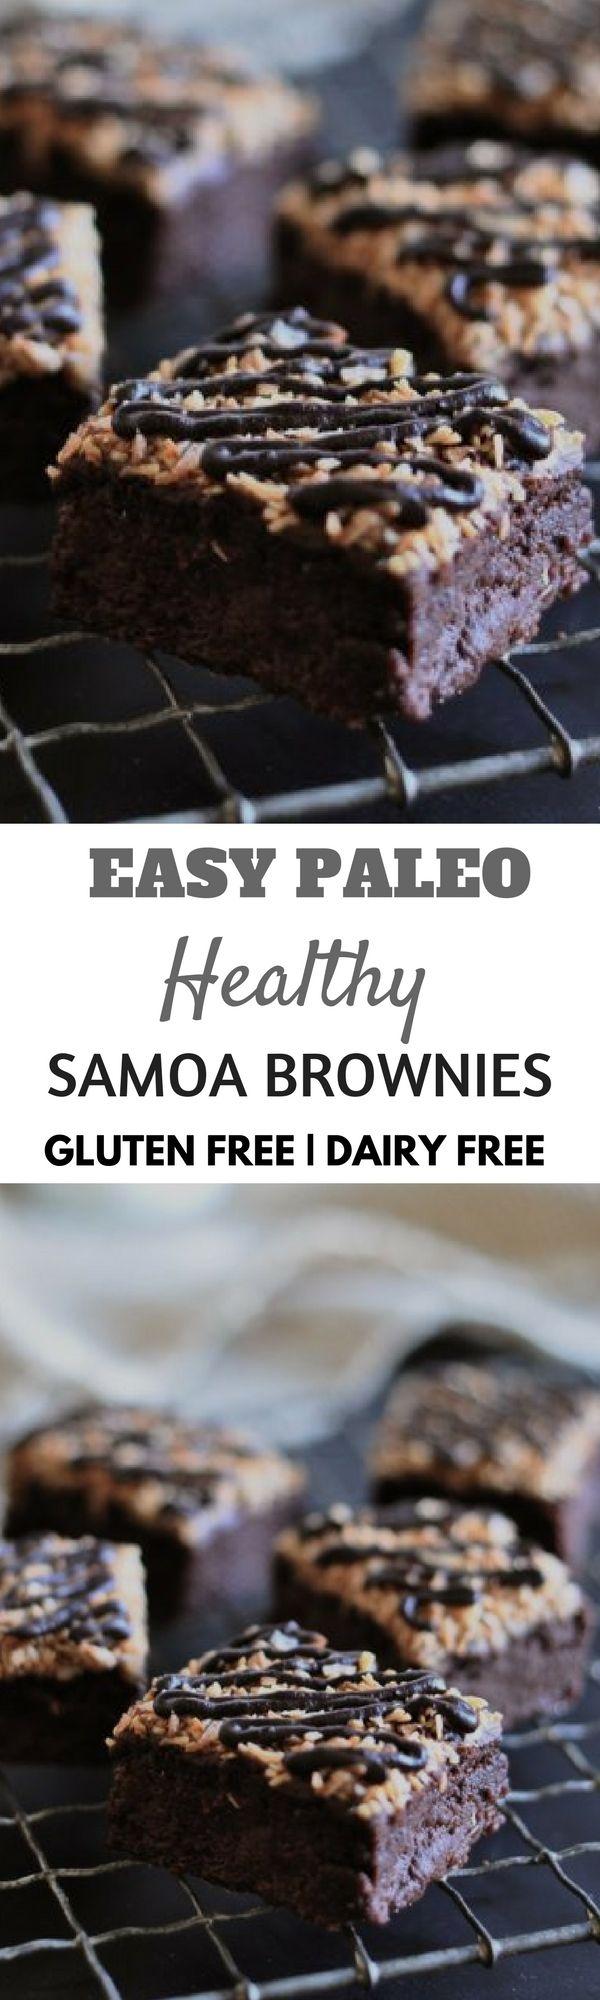 Healthy paleo samoa brownies. Best healthy paleo desserts for summer.